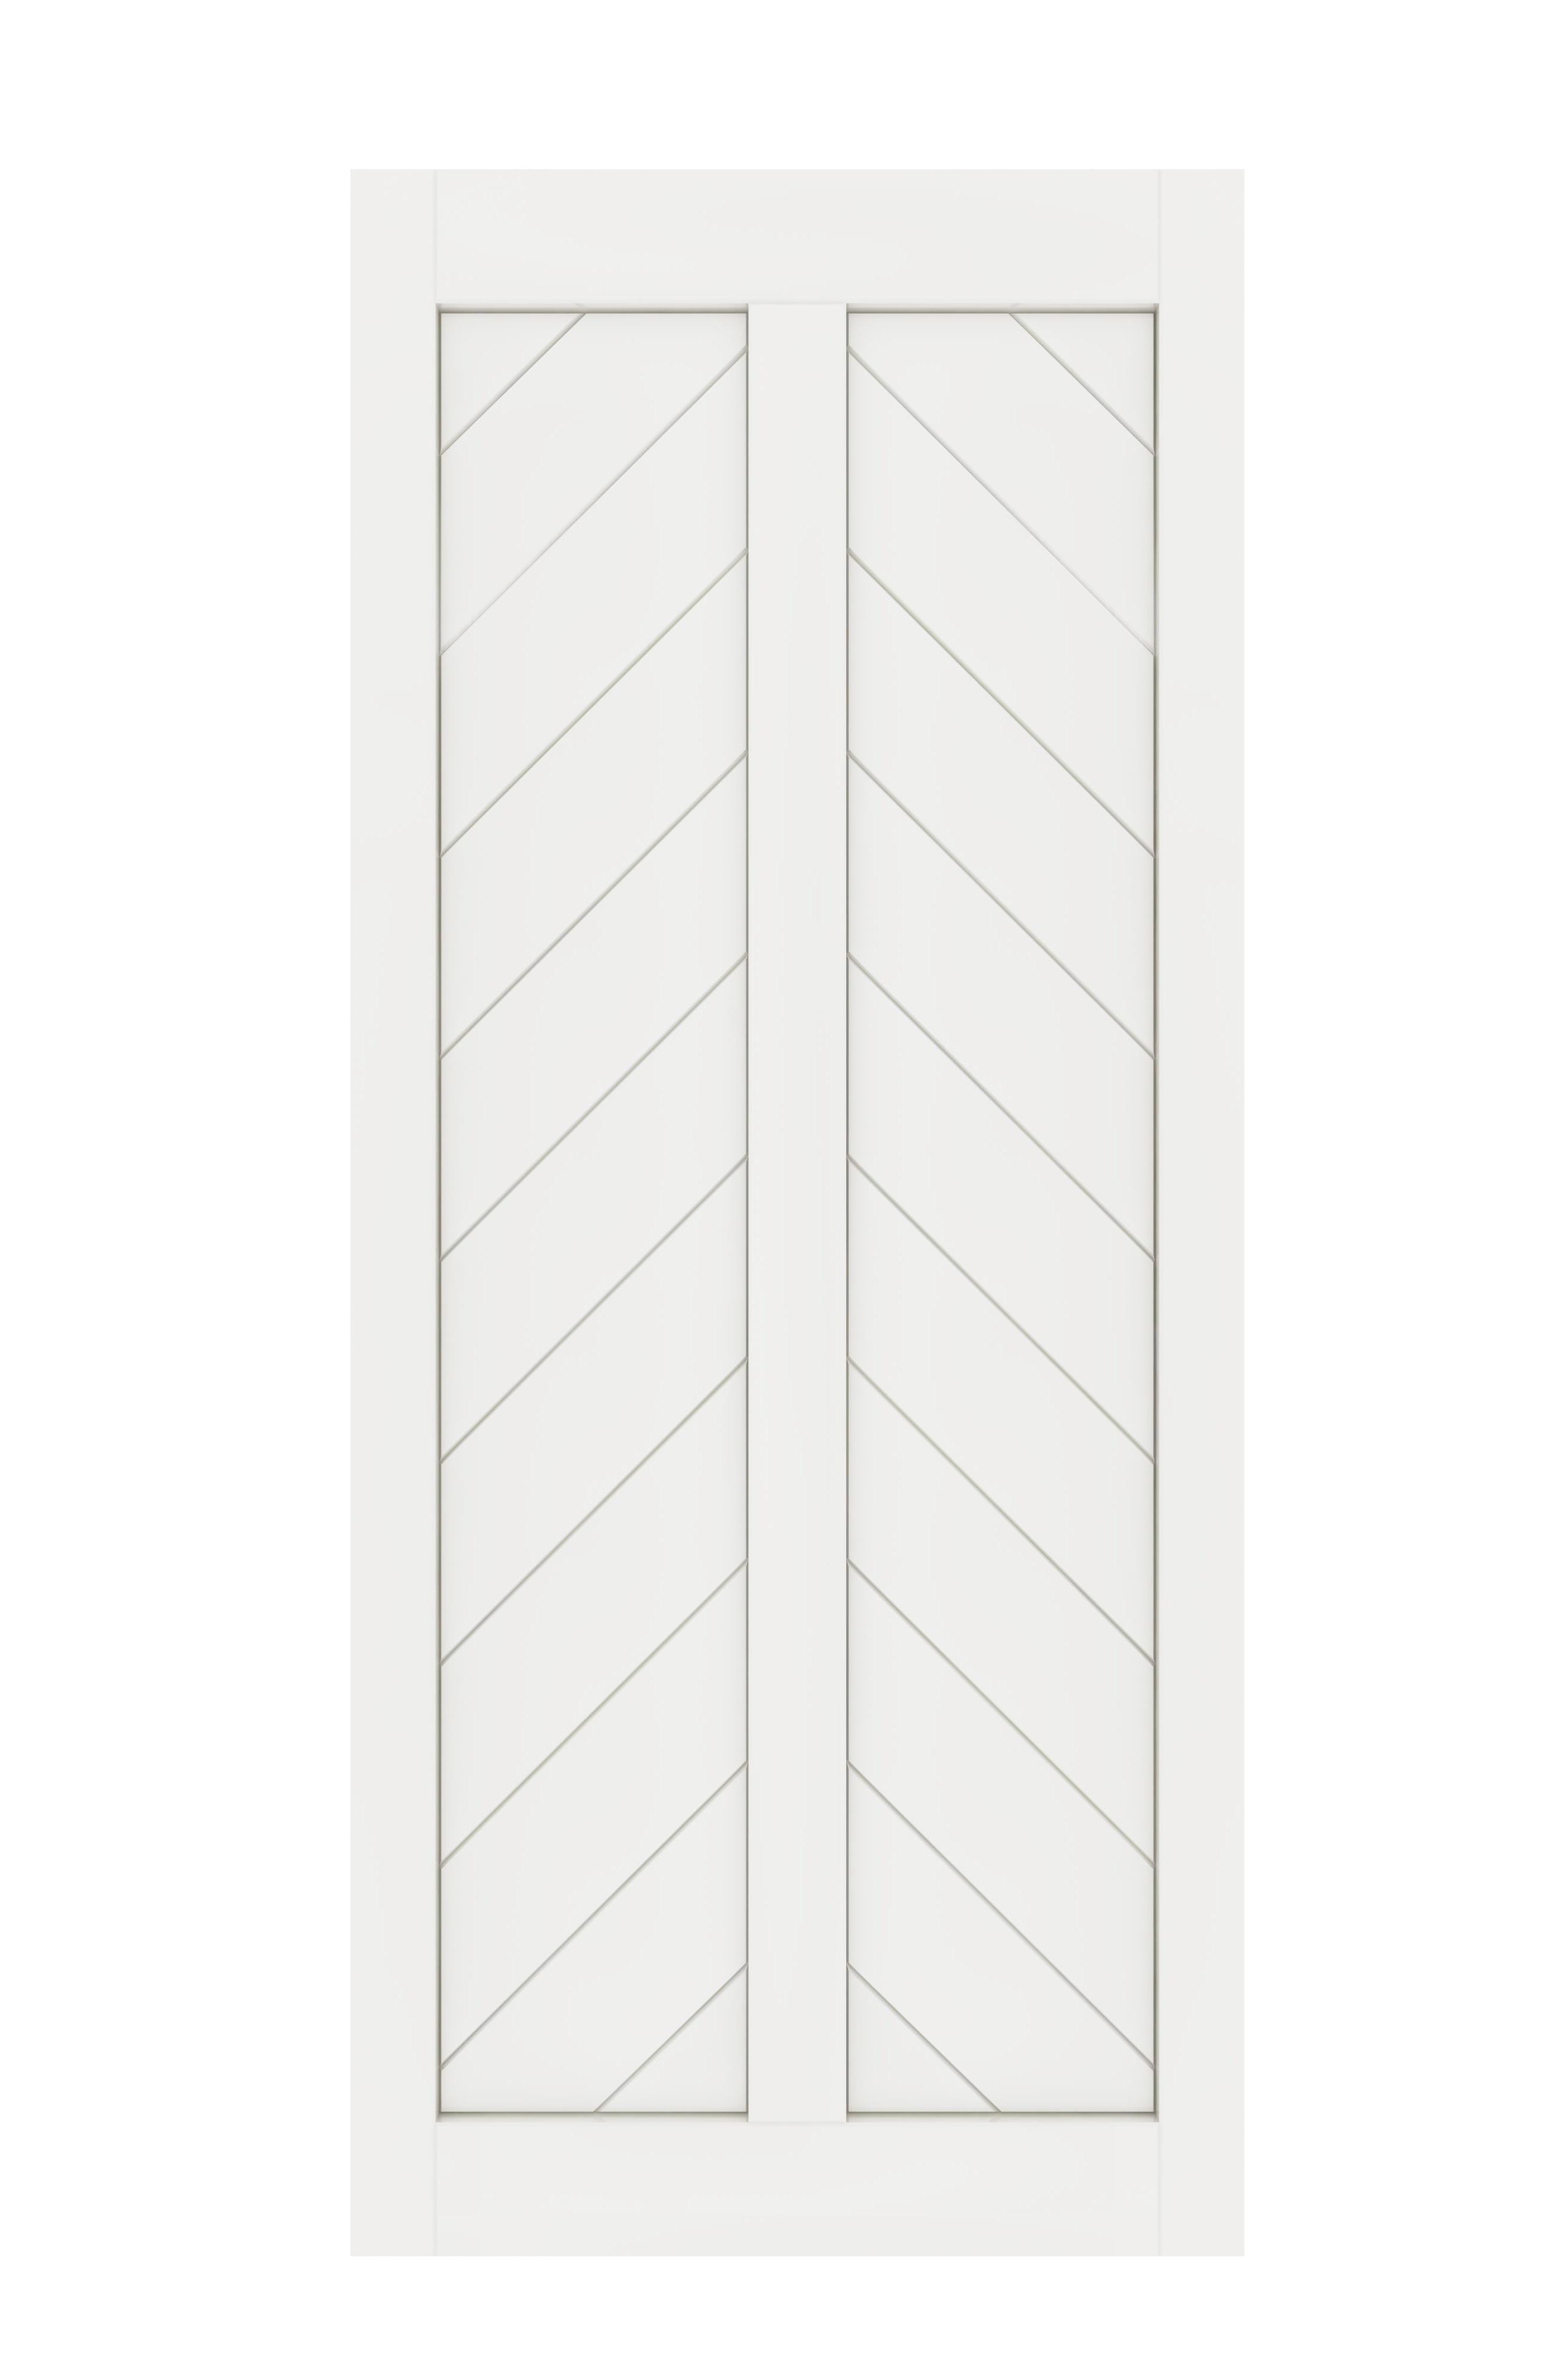 DIYHD Fish Bone V Shape Sliding Barn Slab MDF Solid Core Primed Interior Door Panel(Disassembled)